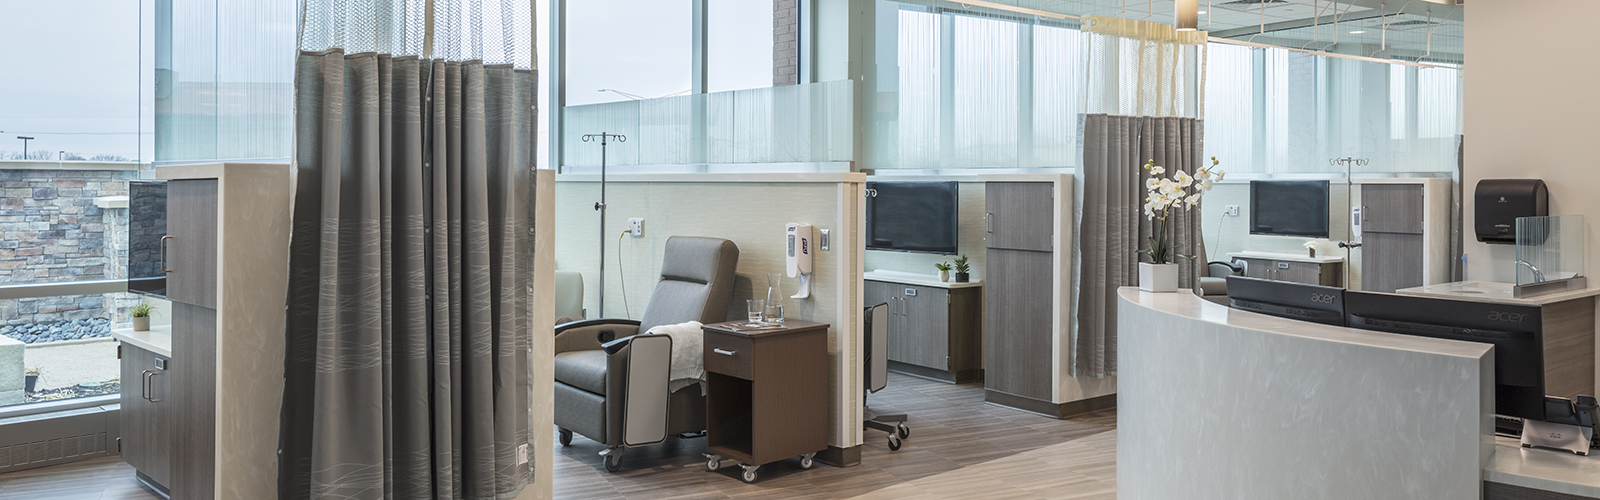 Olathe Medical Center - Cancer Center 3